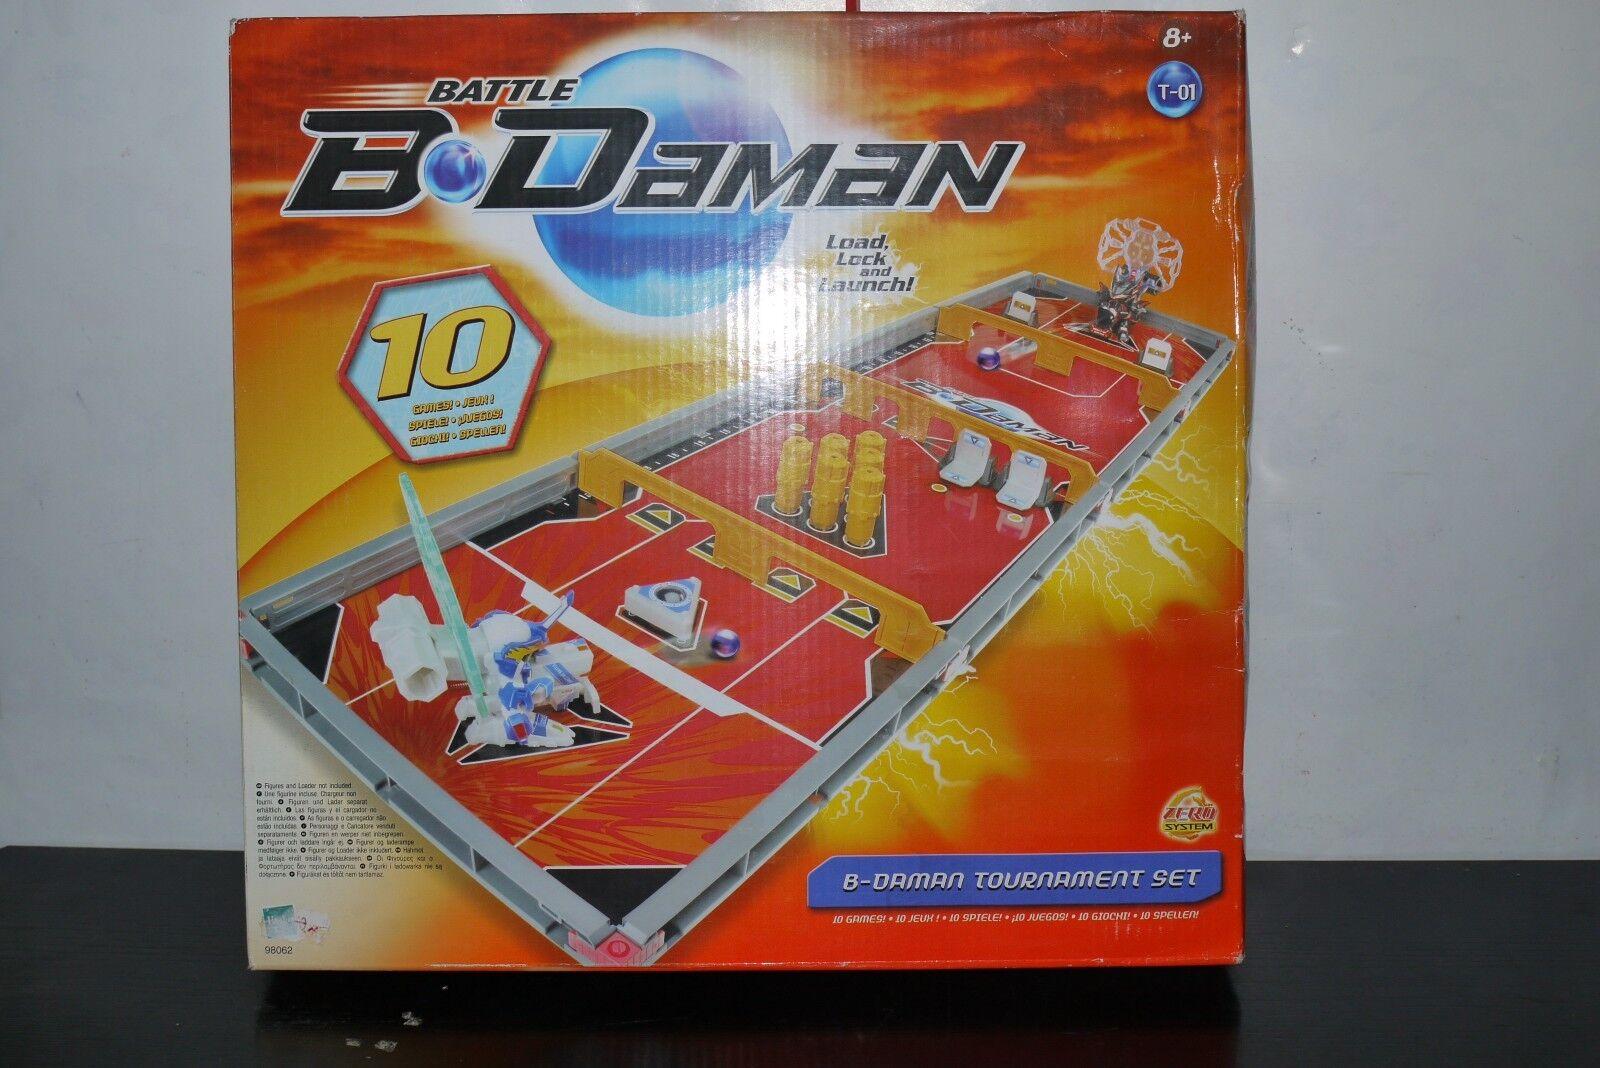 battle B DAMAN 10 GAME FAMILY TOURNASieT SET HASBRO 2005 98062 MIB